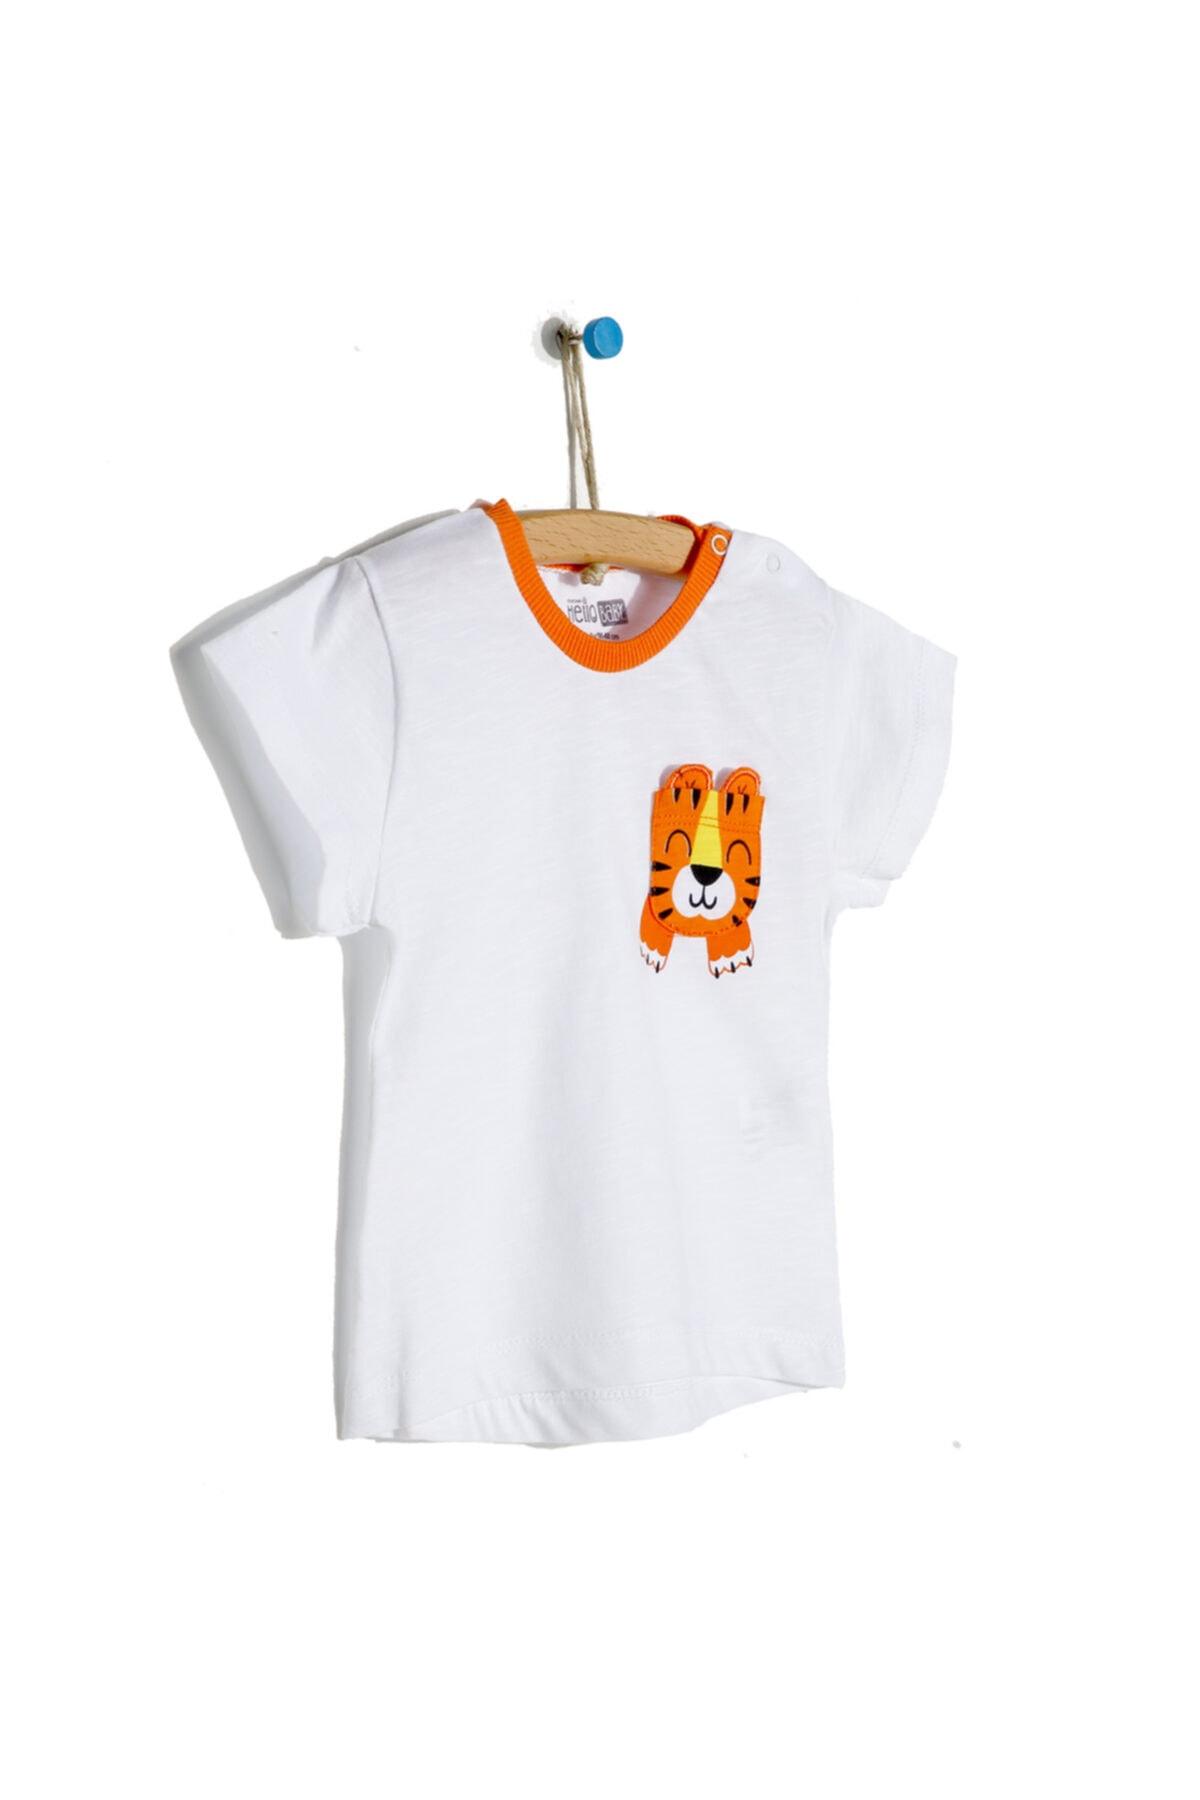 تیشرت نوزاد پسرانه فروش برند HelloBaby کد ty121934140